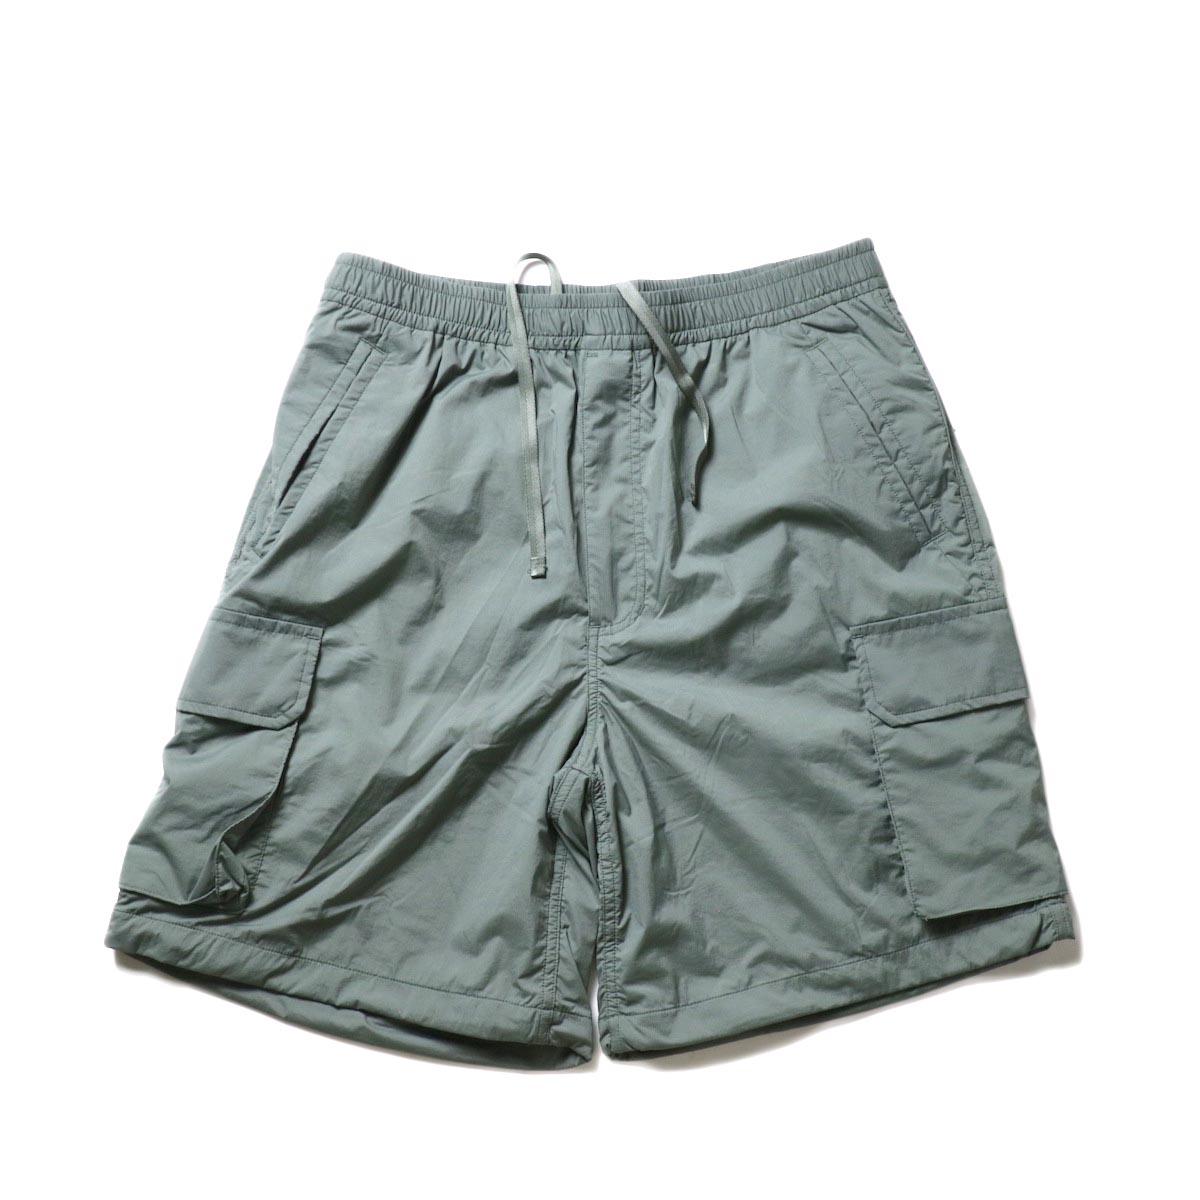 DAIWA PIER39 / Tech French Mil Field Shorts (Gray)